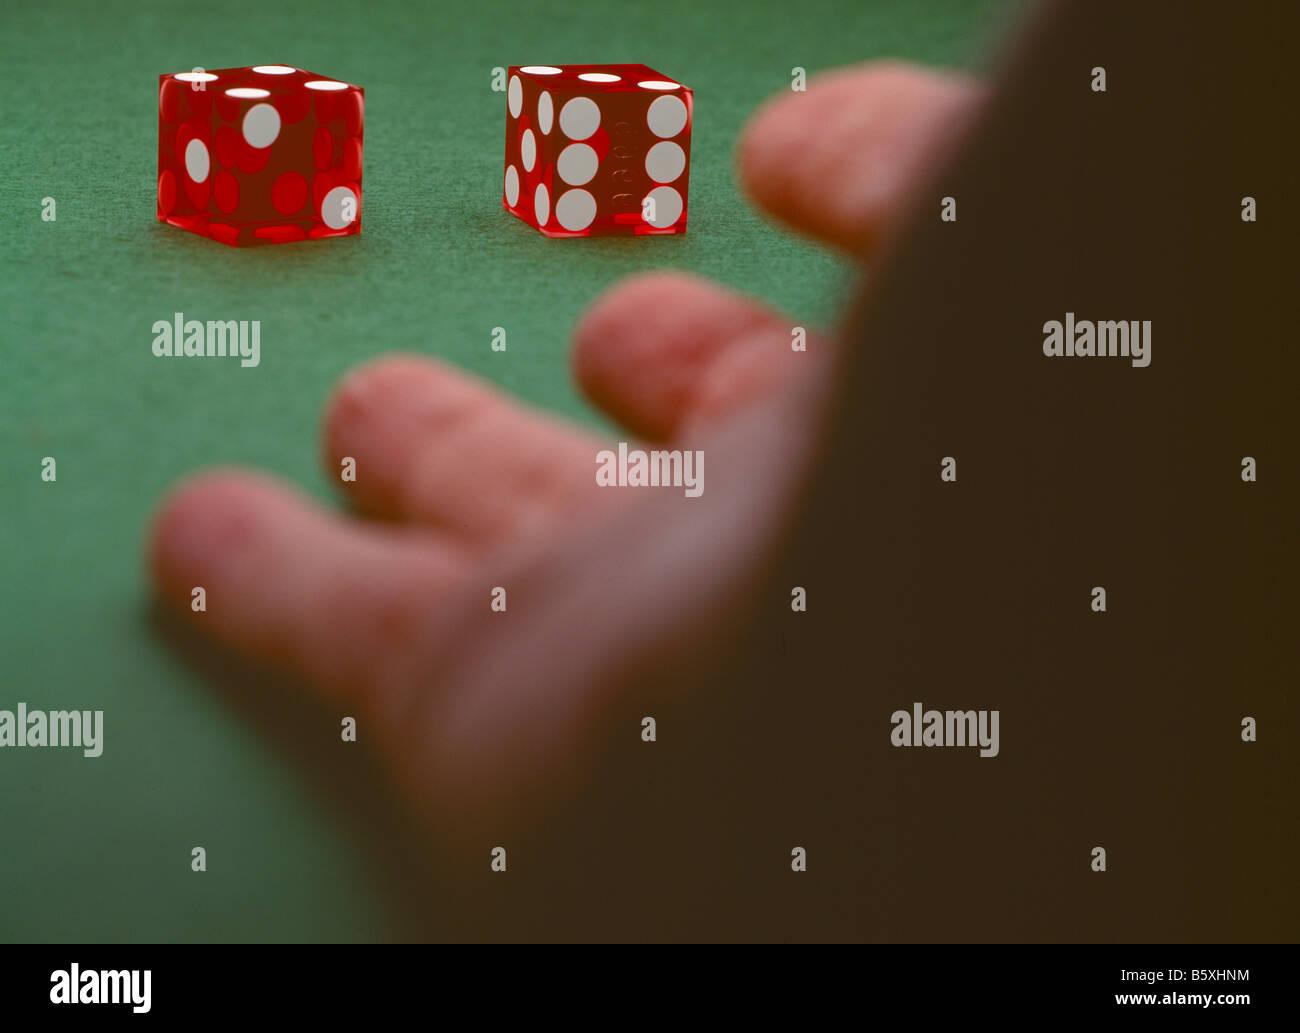 Games of Chance II - Stock Image